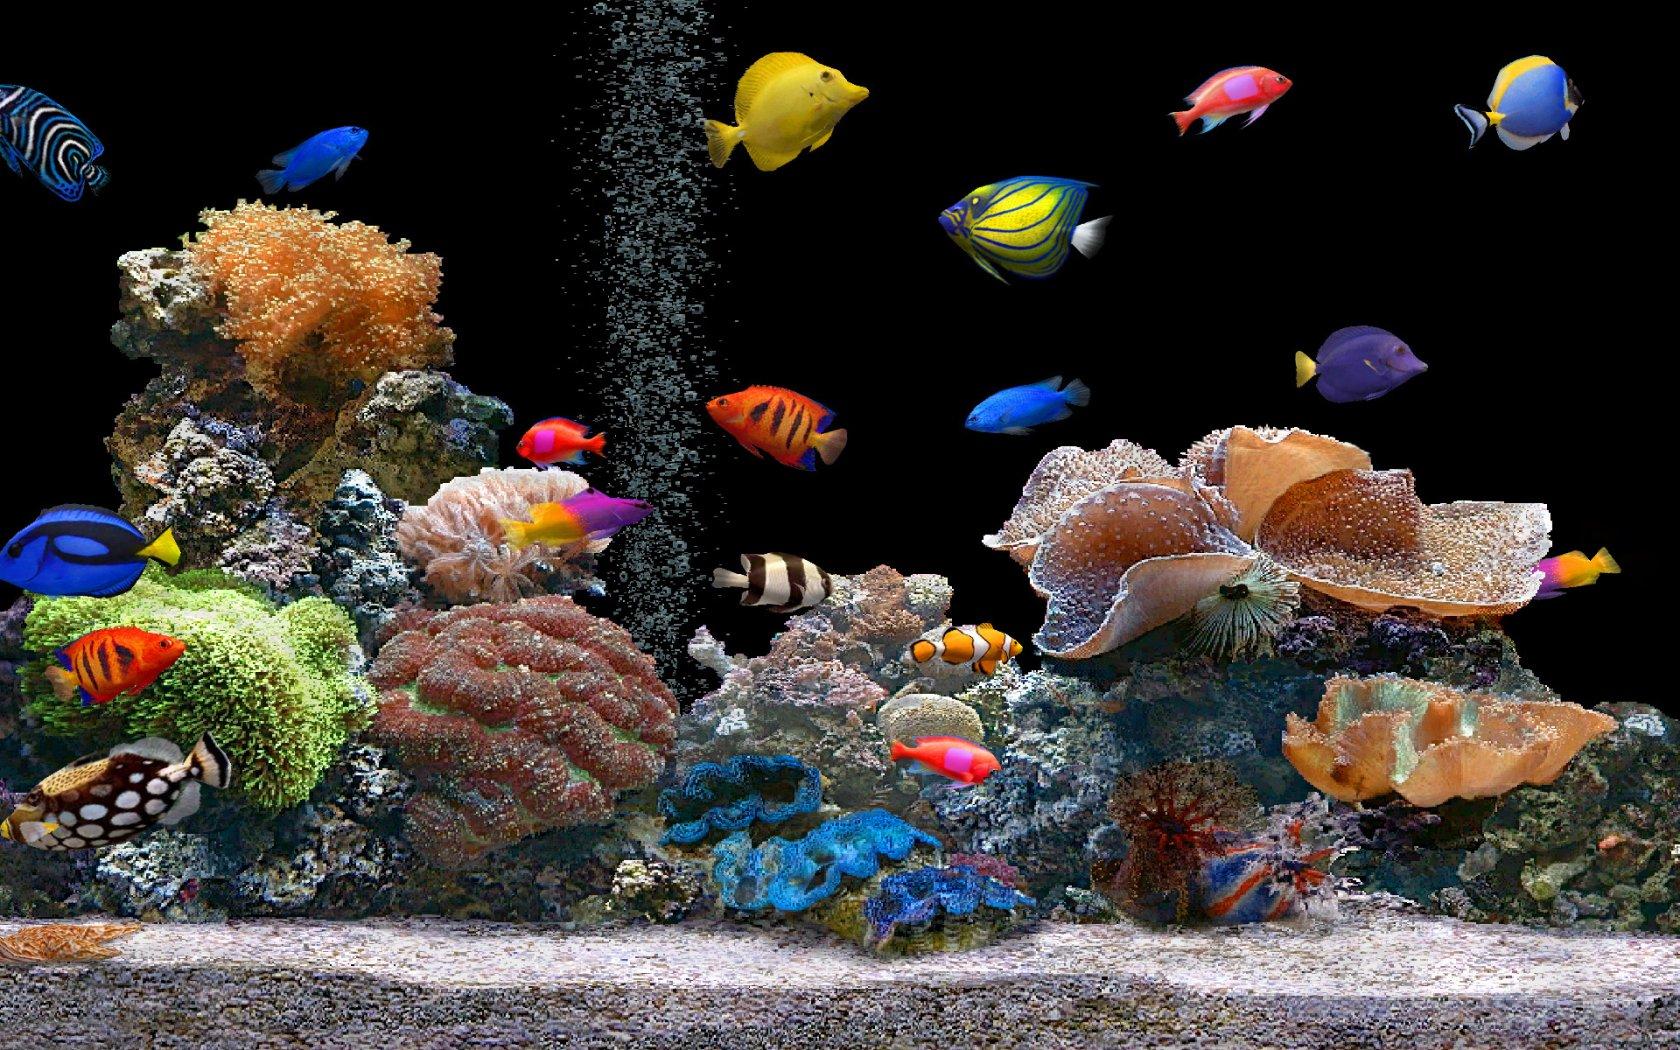 Tropical Fish Tank HD Wallpapers Tropical Fish Tank Desktop 1680x1050